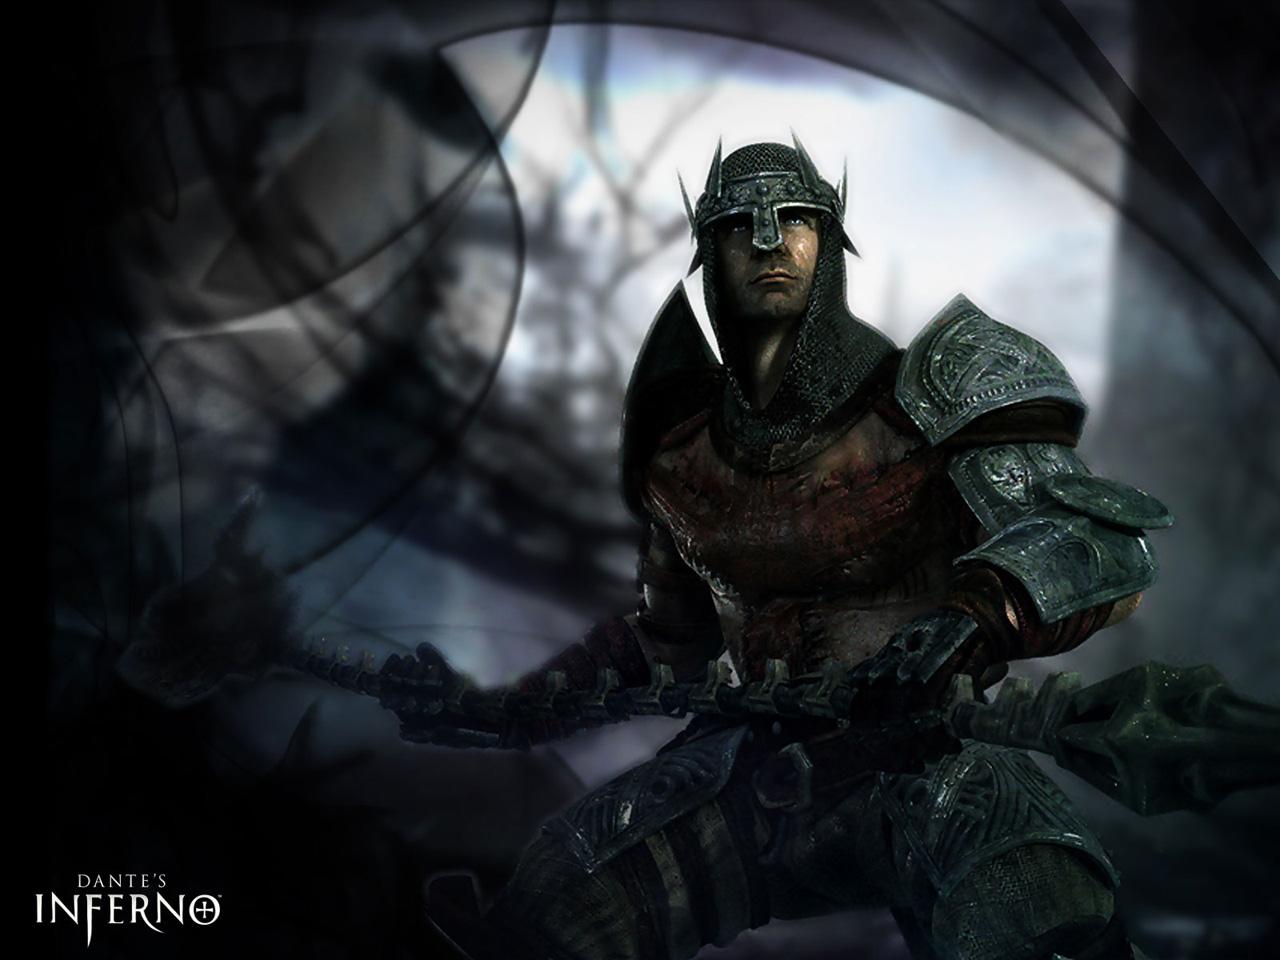 Add Media Report Rss Wallpaper - Dante's Inferno Game Monster , HD Wallpaper & Backgrounds